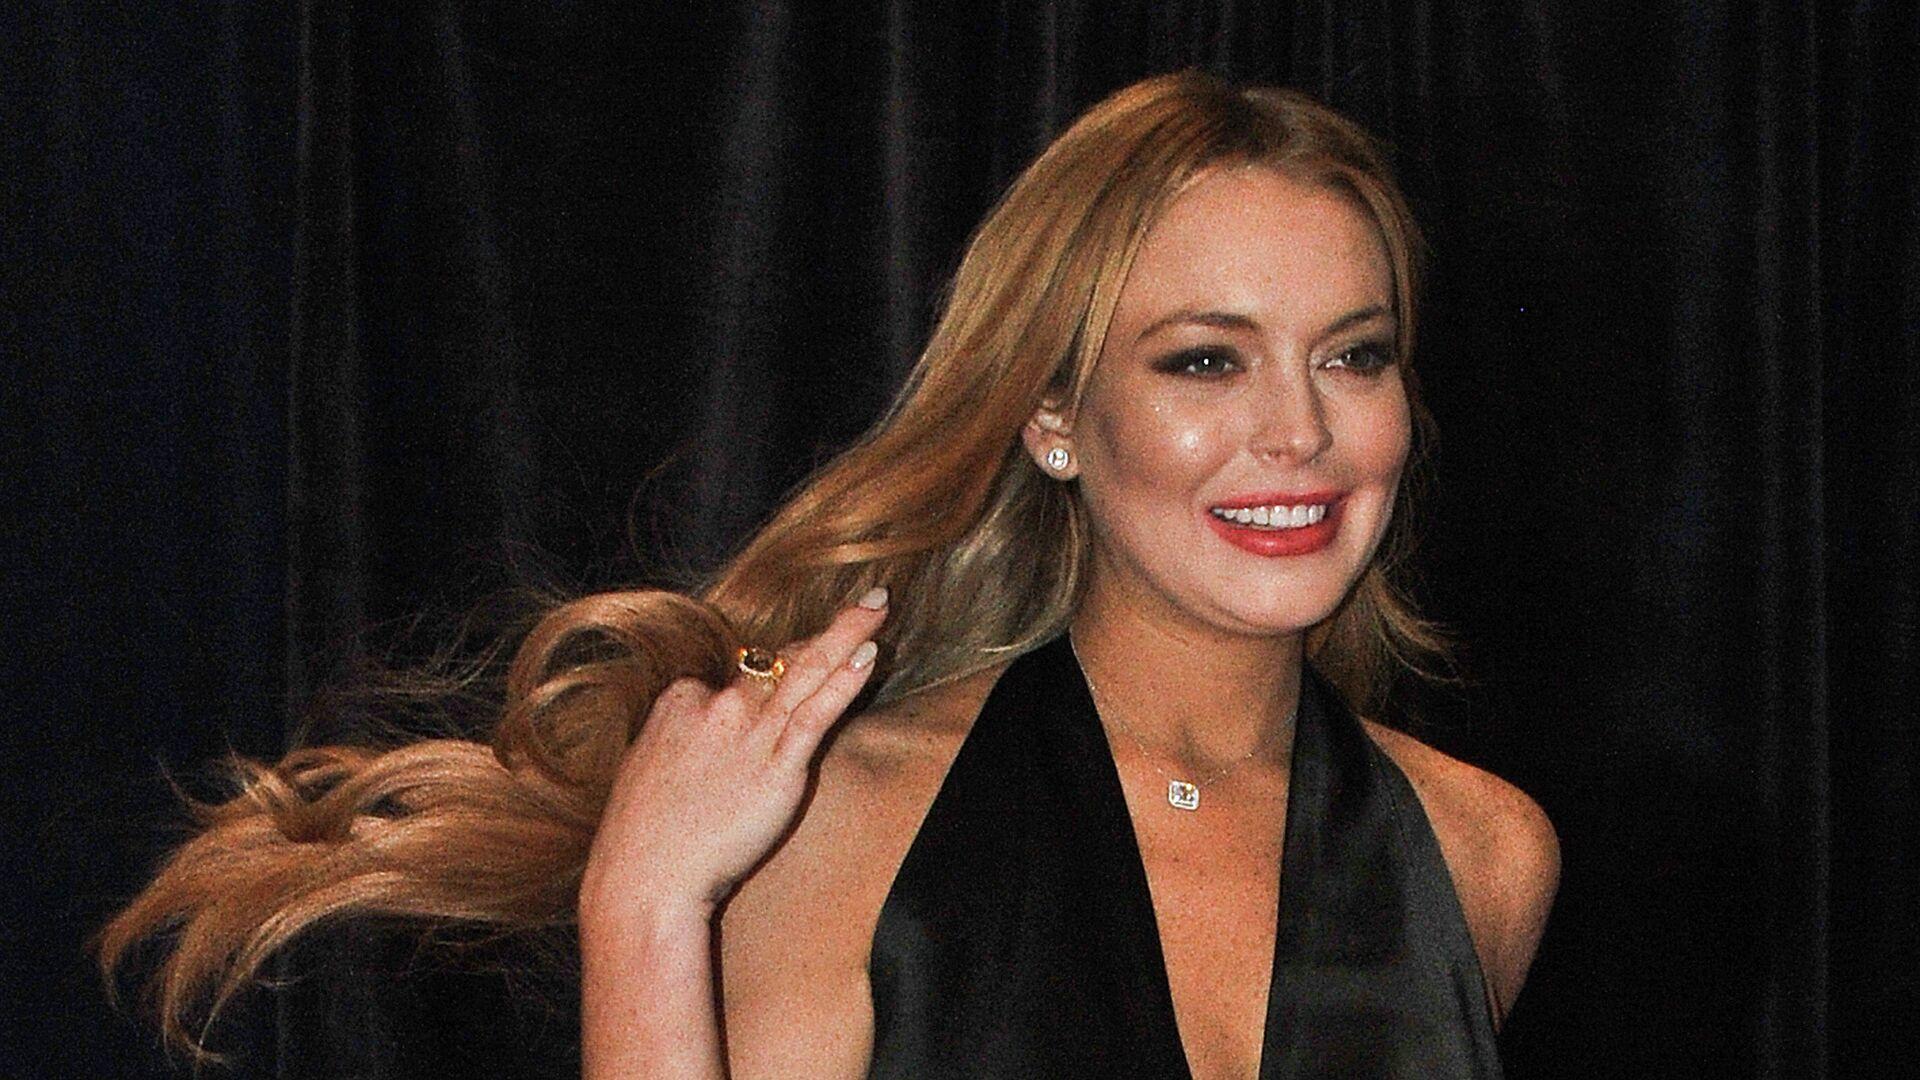 US actress Lindsay Lohan arrive at the annual White House Correspondents' Association dinner in Washington on April 28, 2012.  - Sputnik Mundo, 1920, 24.02.2021